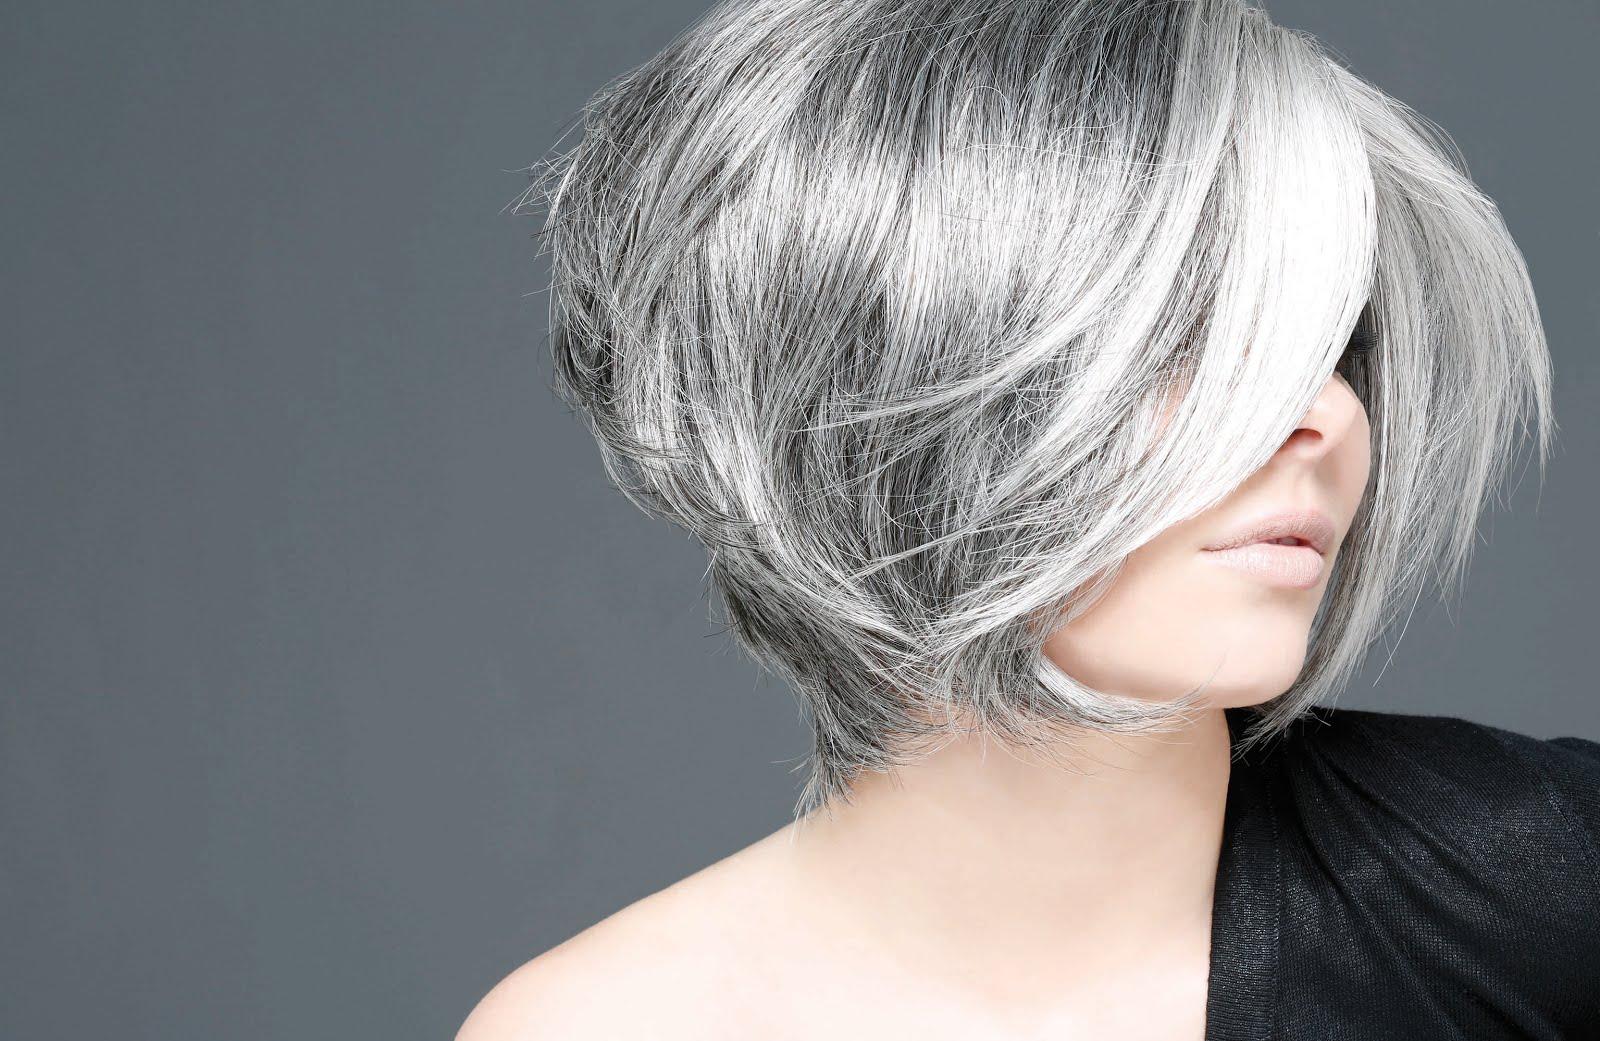 Cheveux blancs a la mode